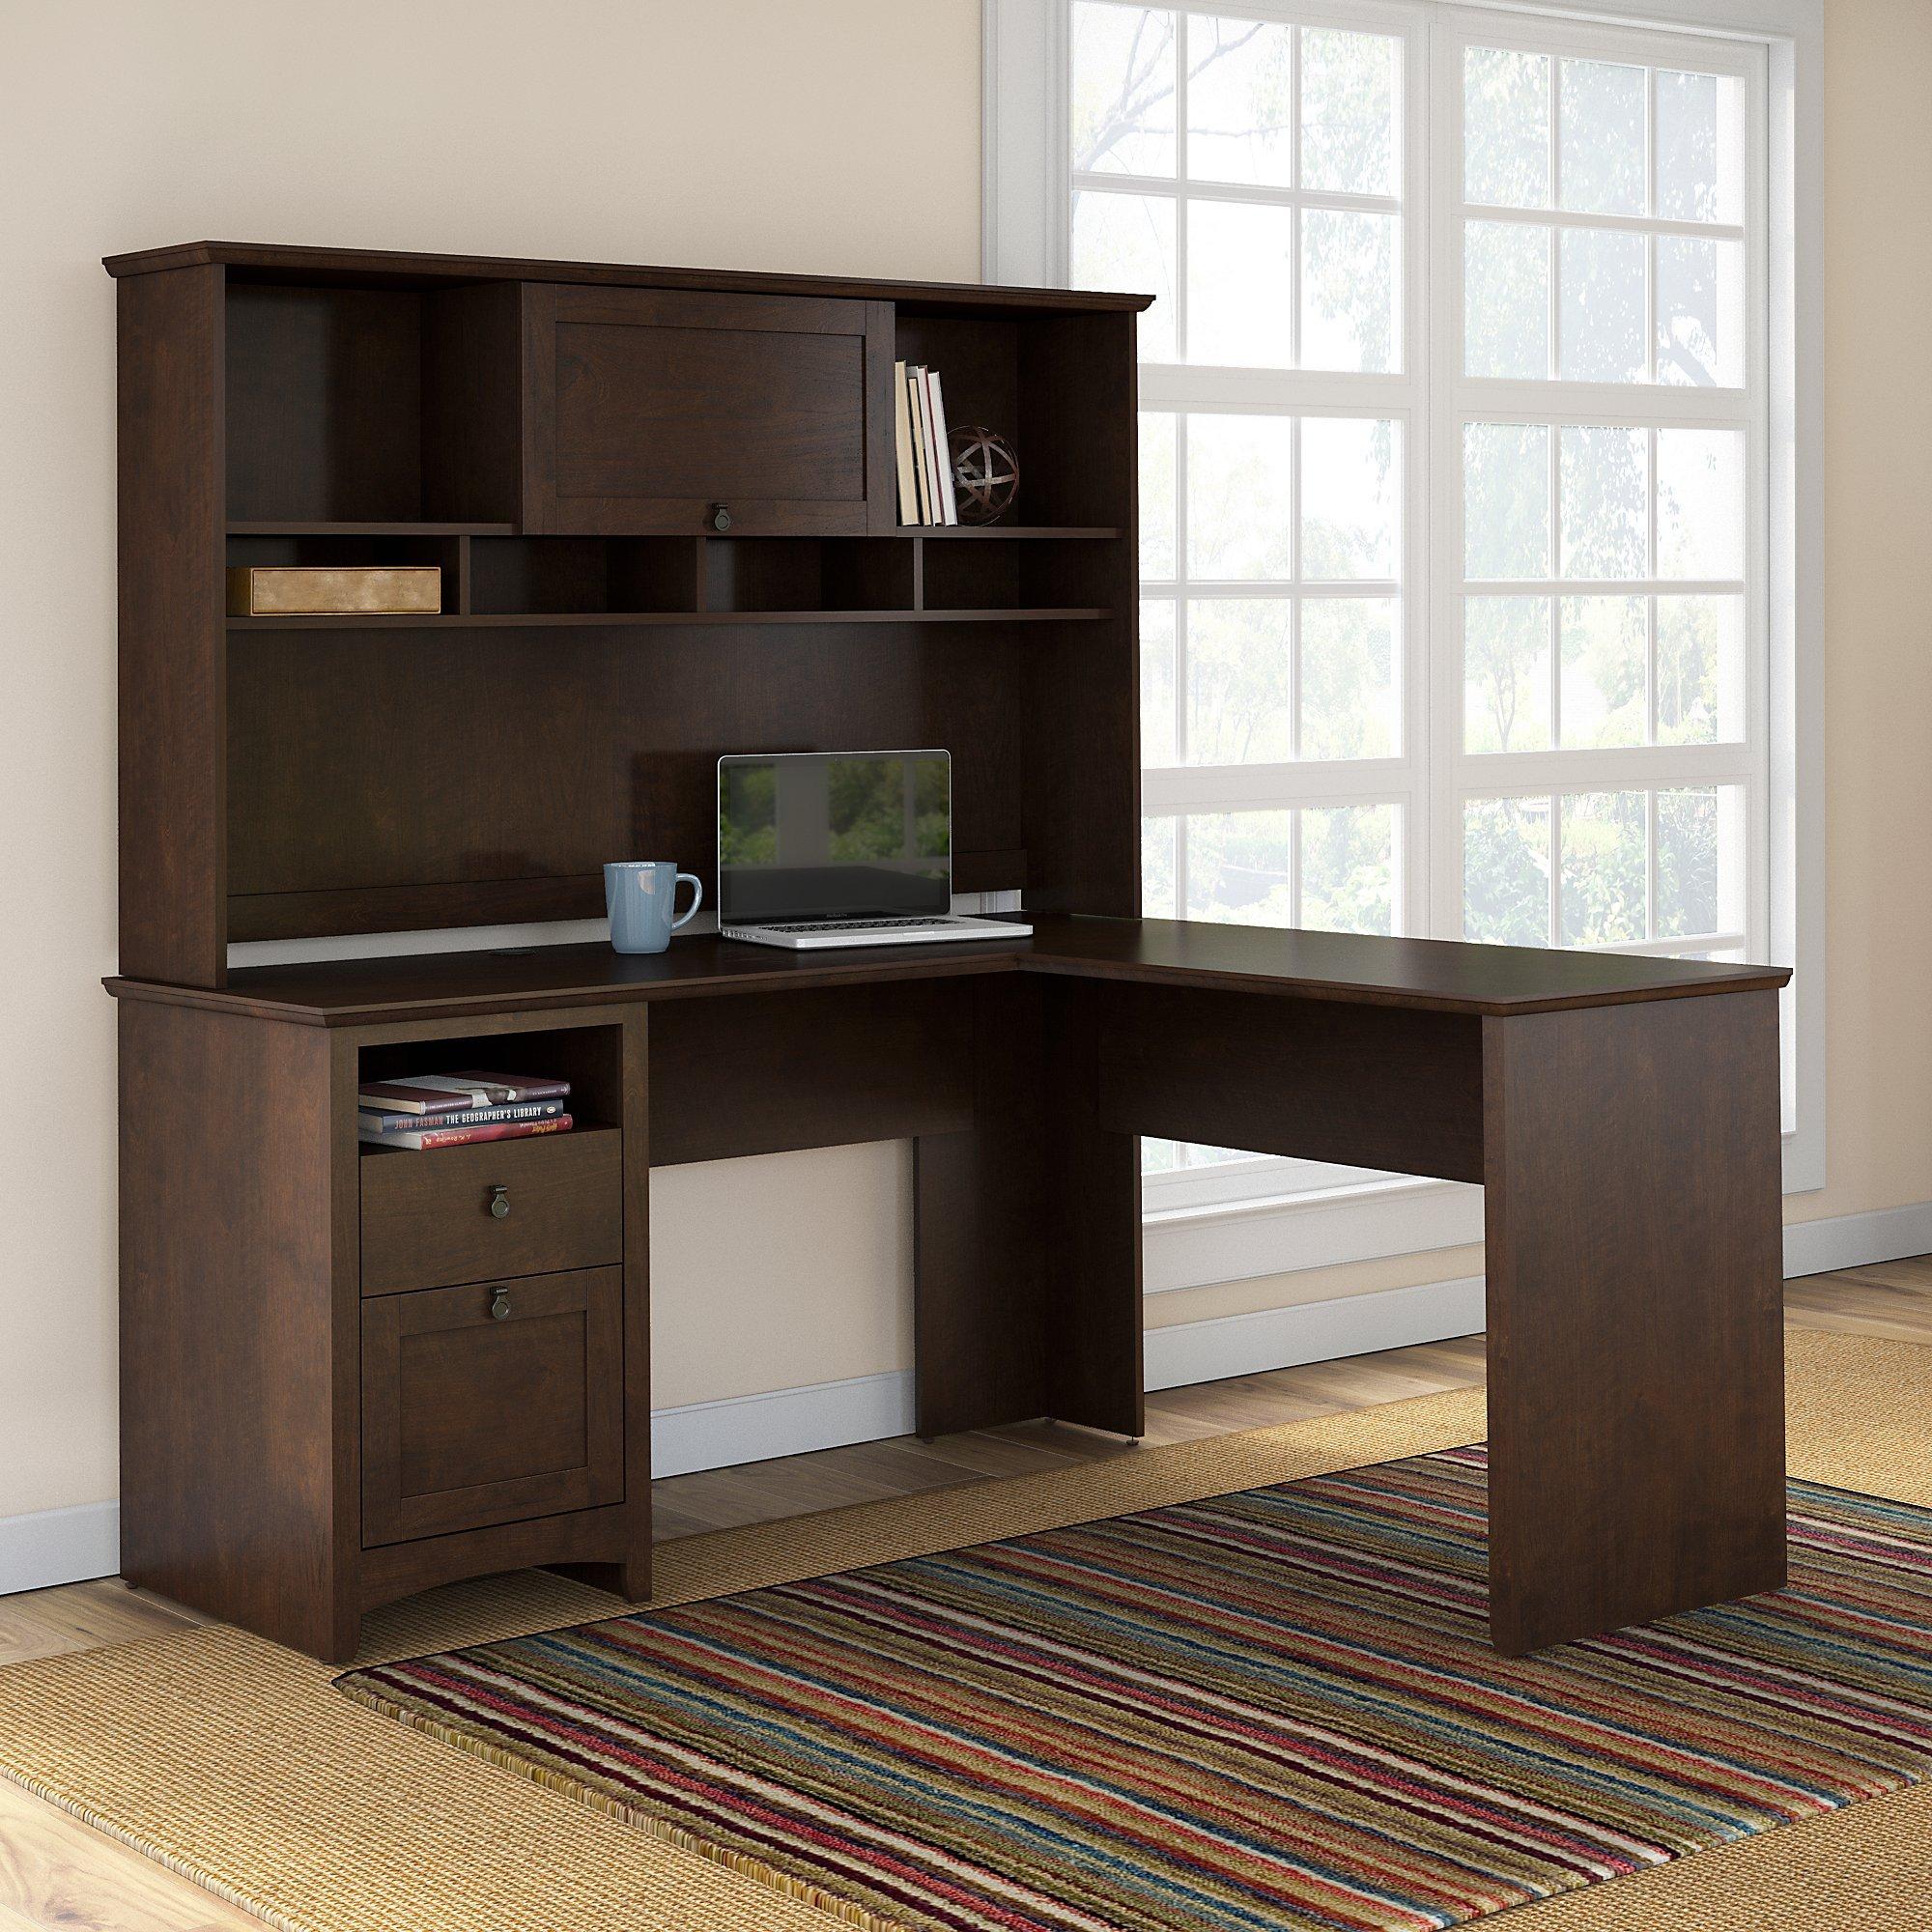 Buena Vista L Shaped Desk with Hutch in Madison Cherry by Bush Furniture